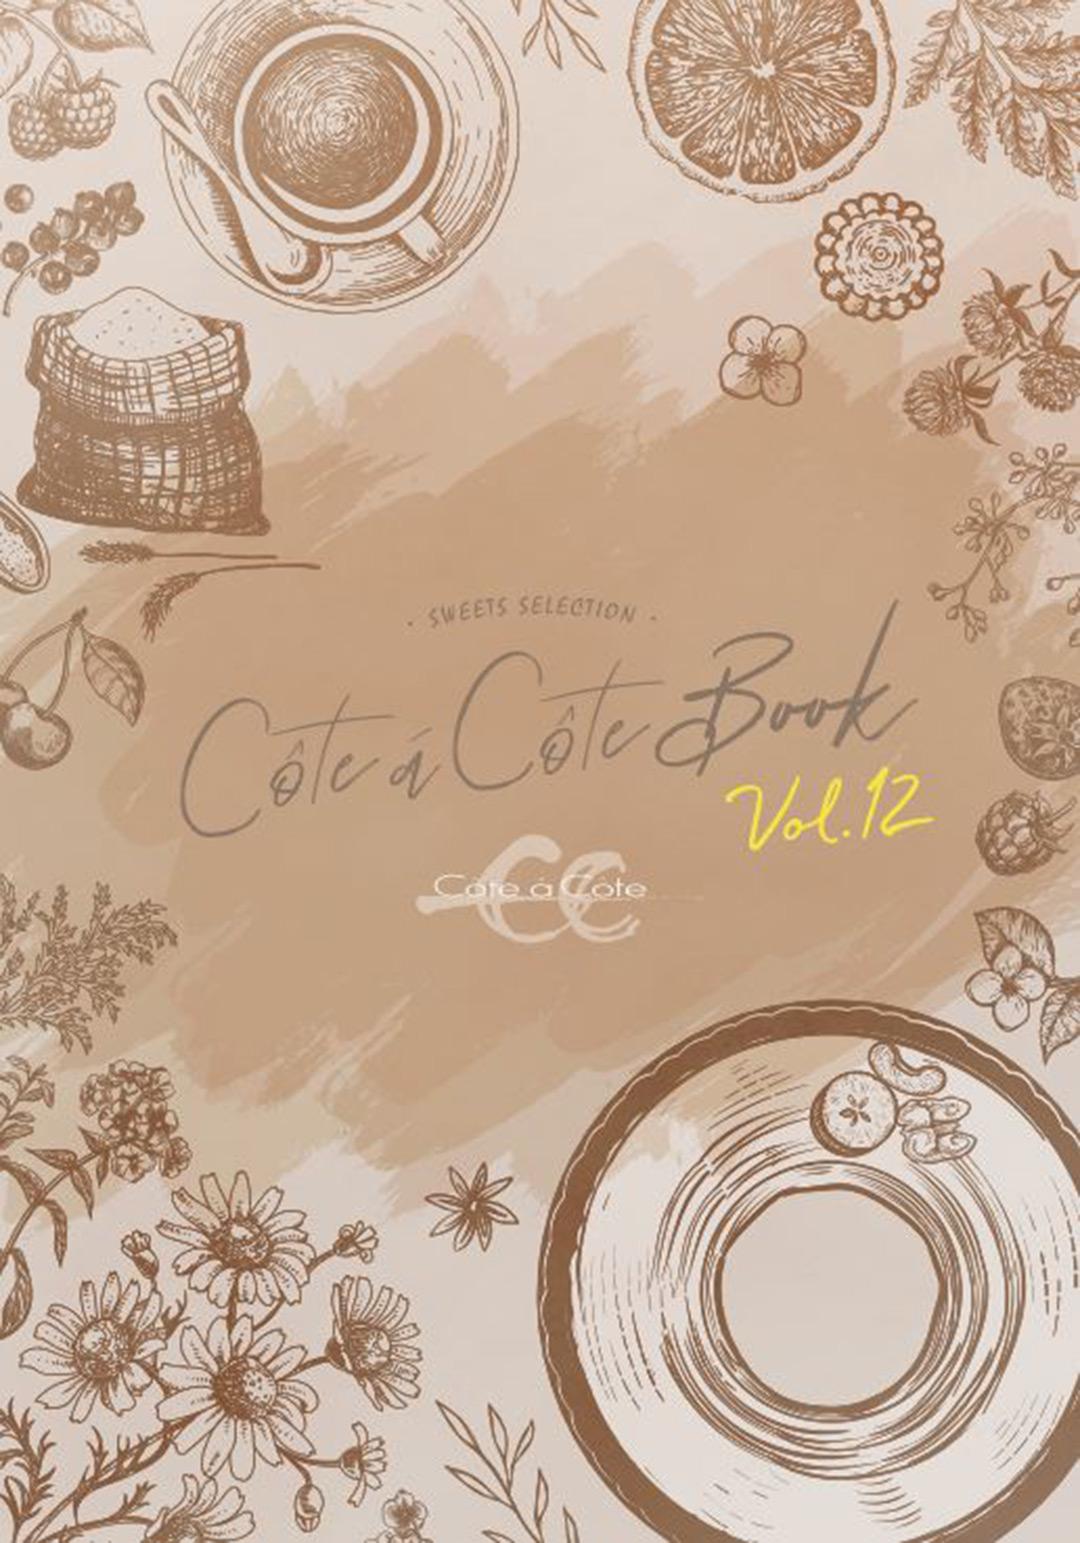 COTE A COTE BOOK